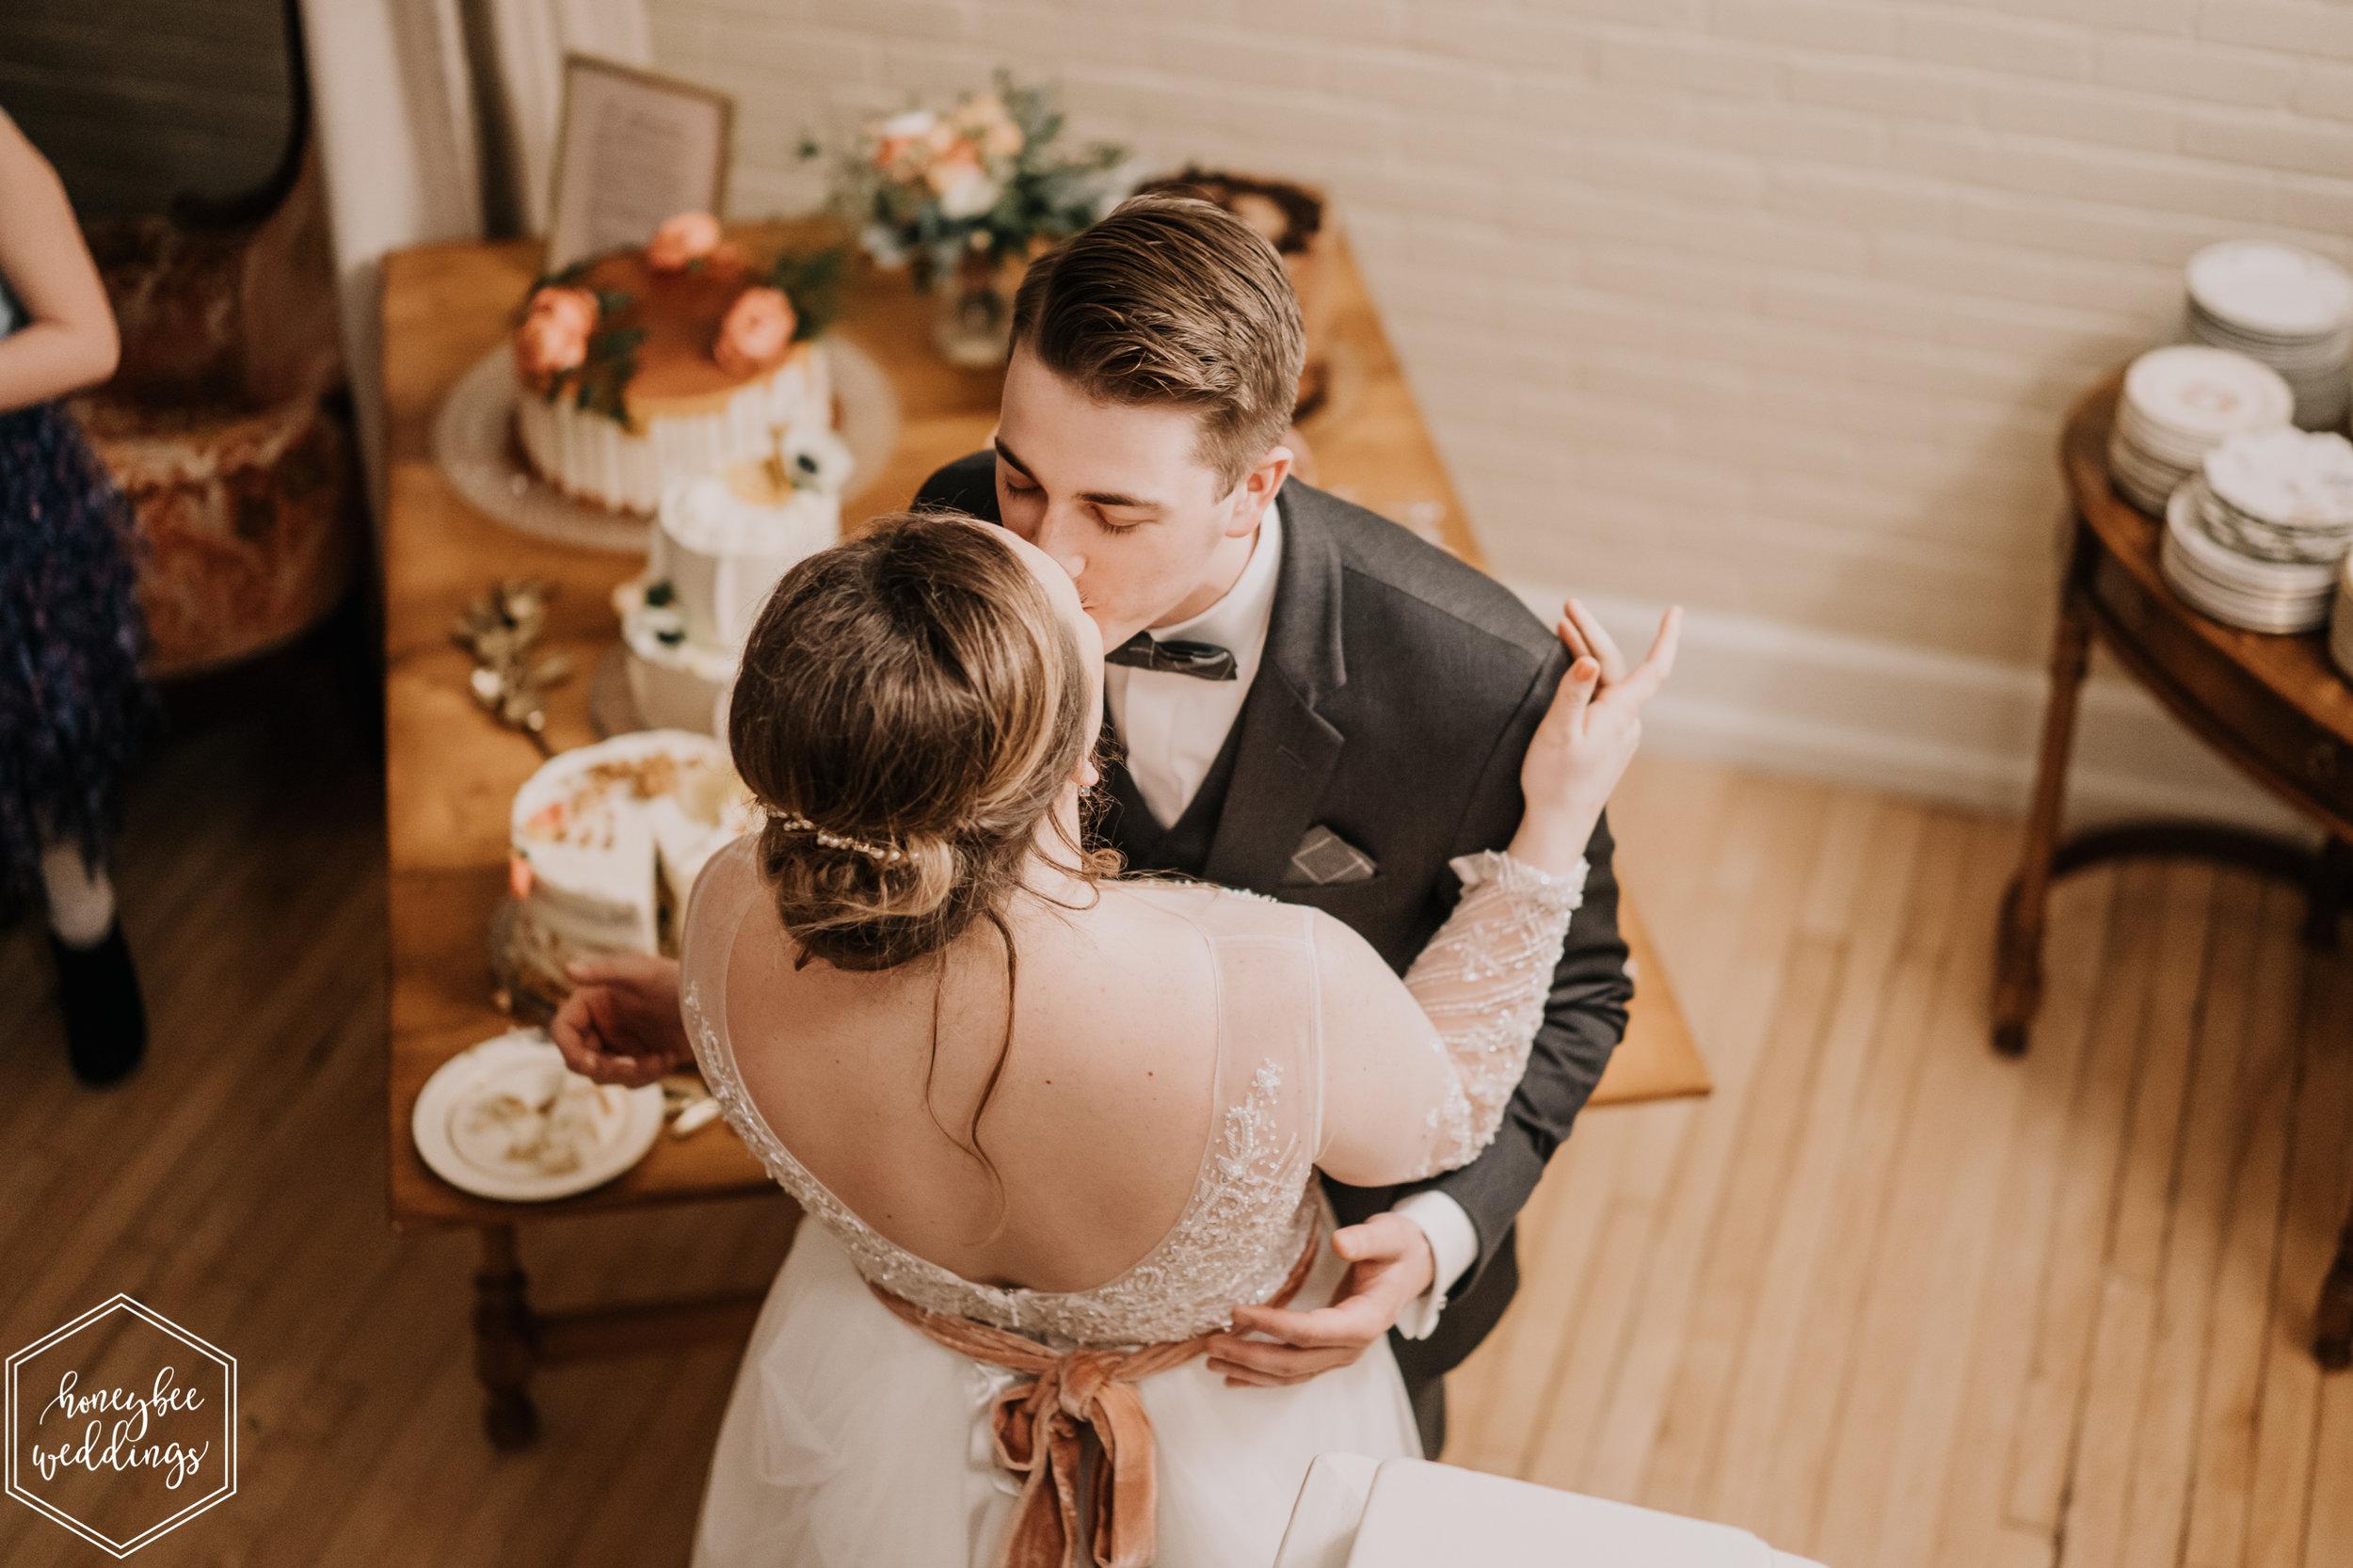 0293Montana Wedding Photographer_Montana winter wedding_Wedding at Fort Missoula_Meri & Carter_January 19, 2019-260.jpg